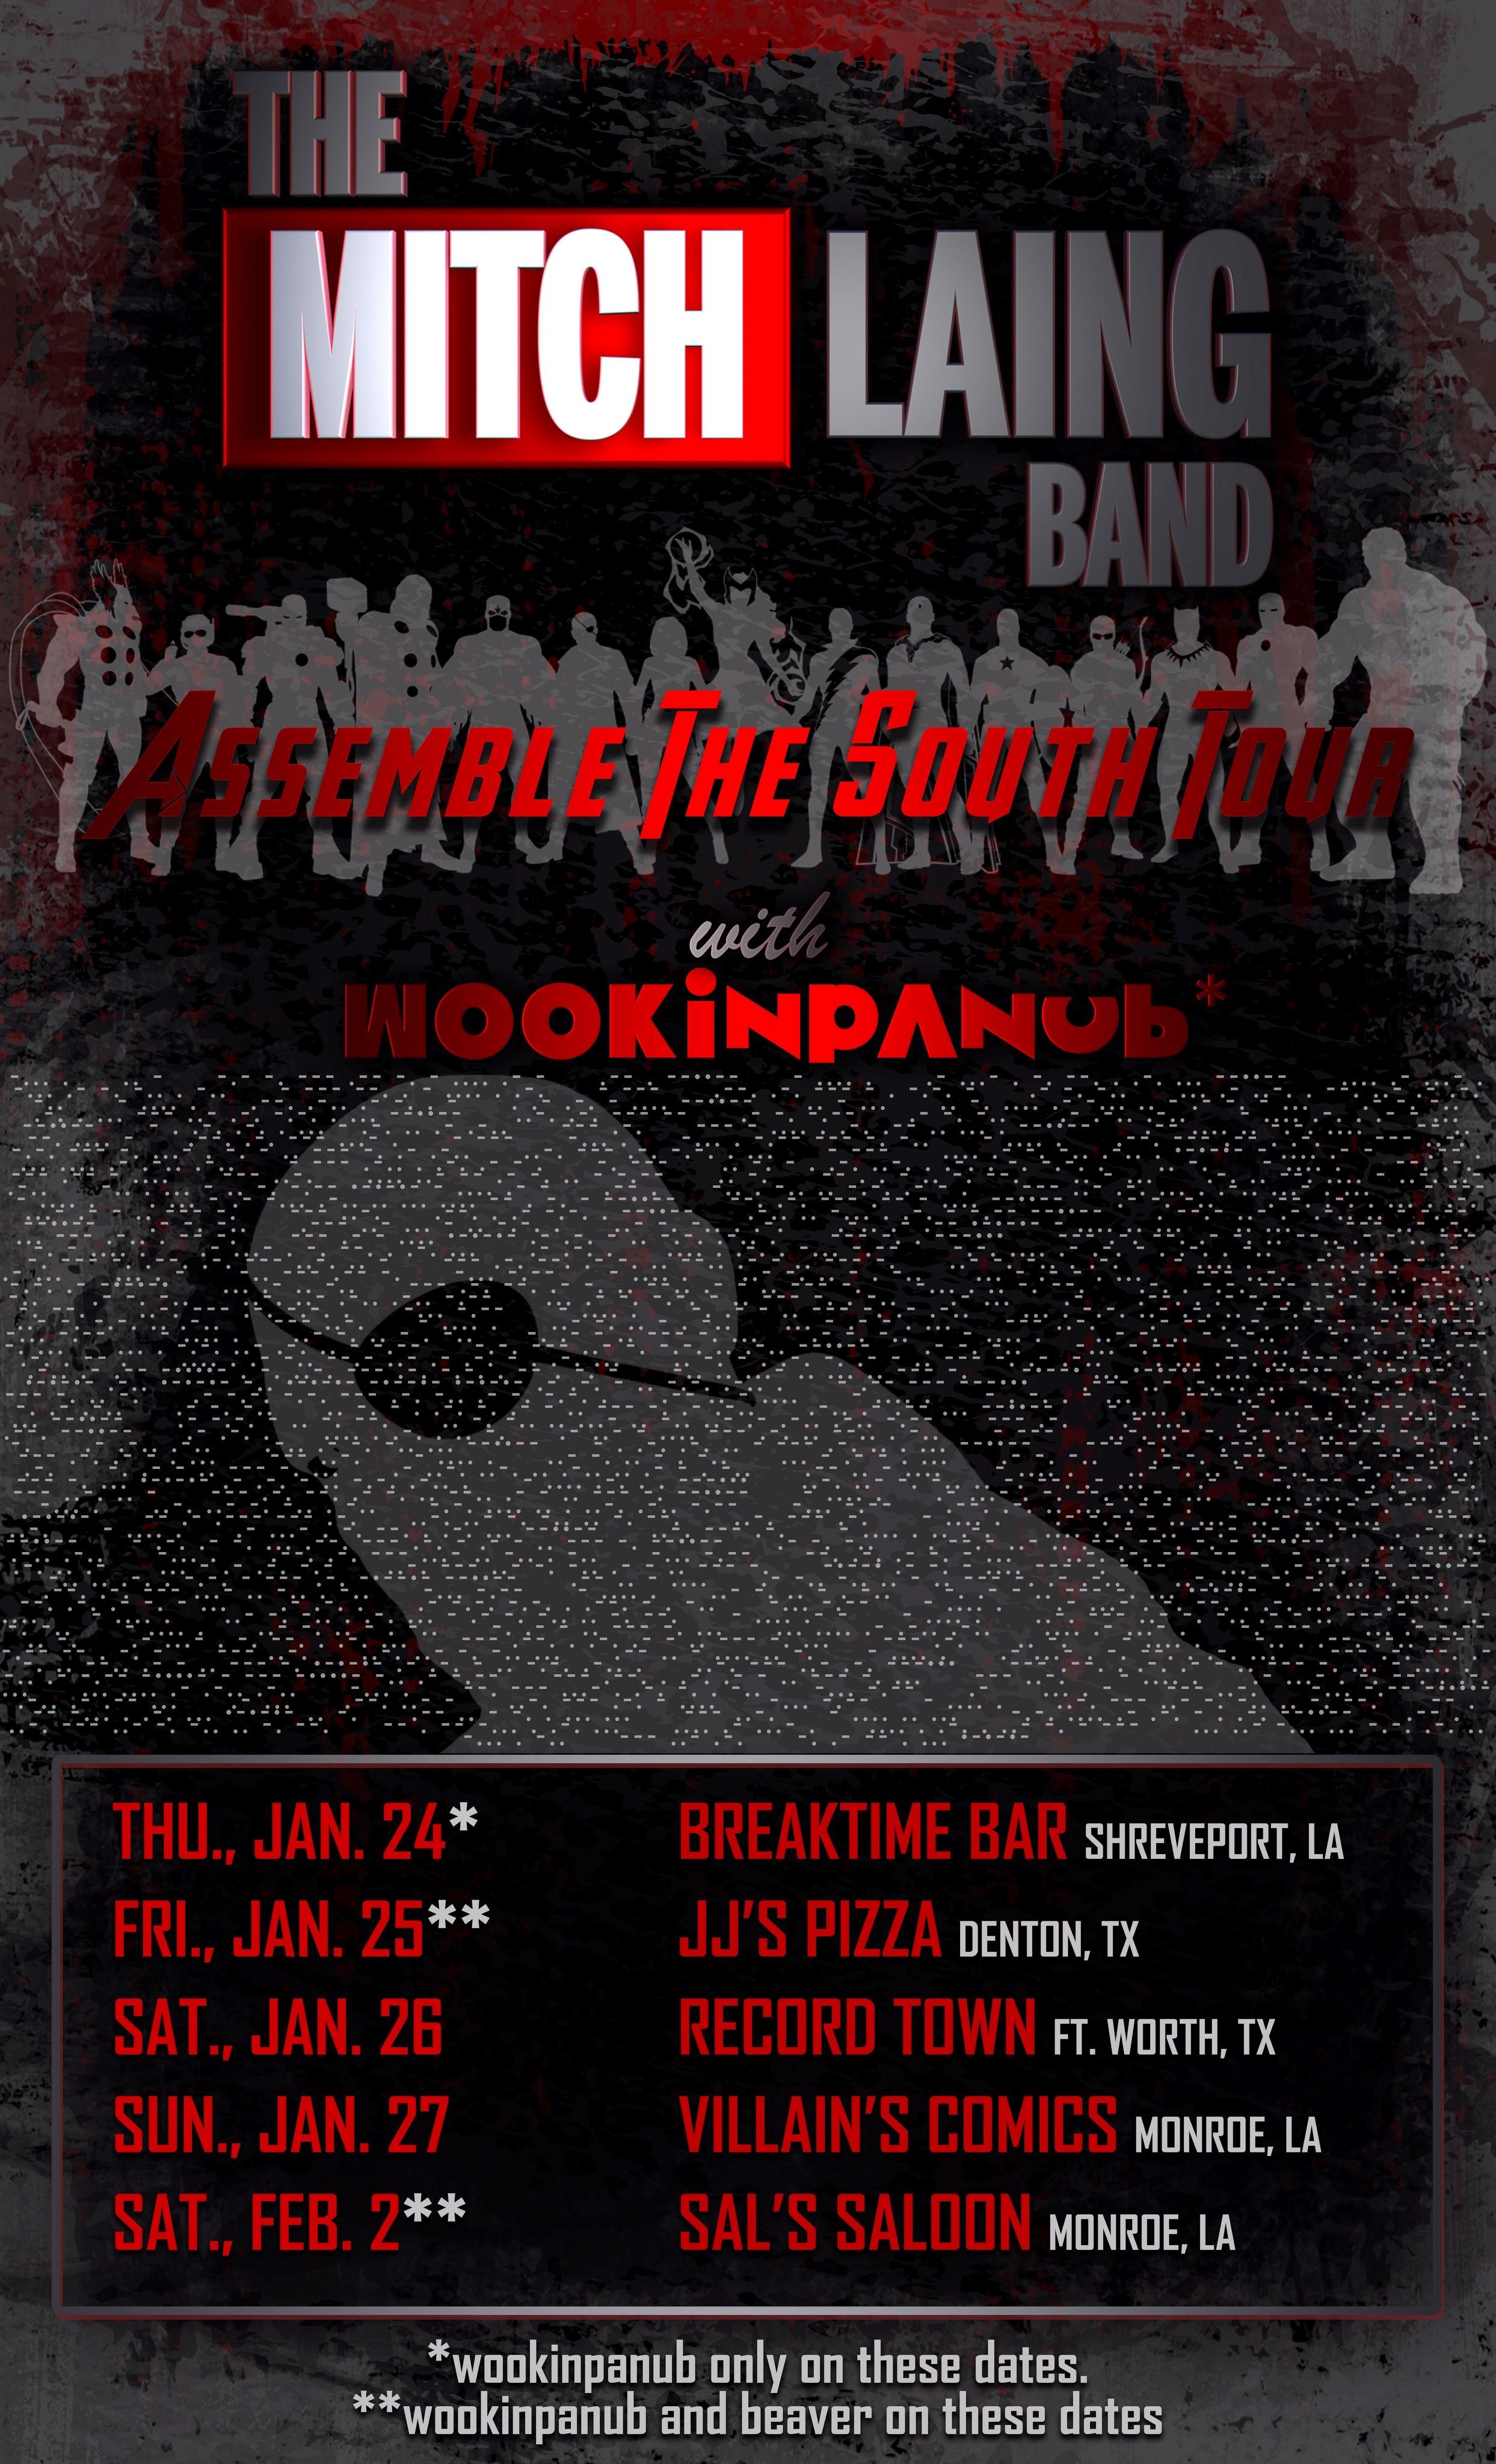 Mitch Laing Band Tour Dates.jpg